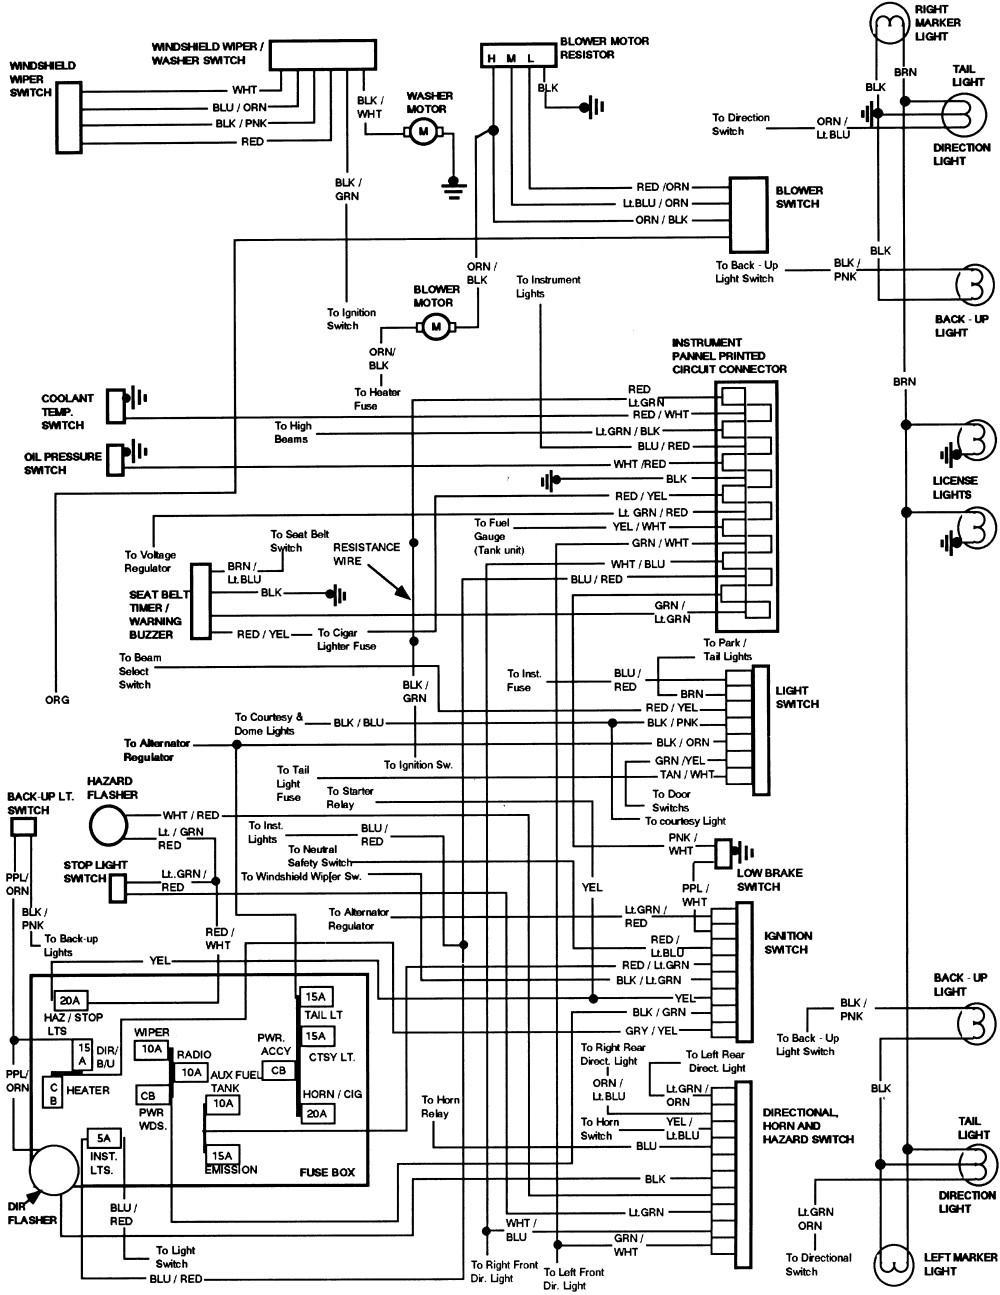 1994 Ford Wiring Diagrams - Data Wiring Diagram Detailed - Ford Wiring Diagram